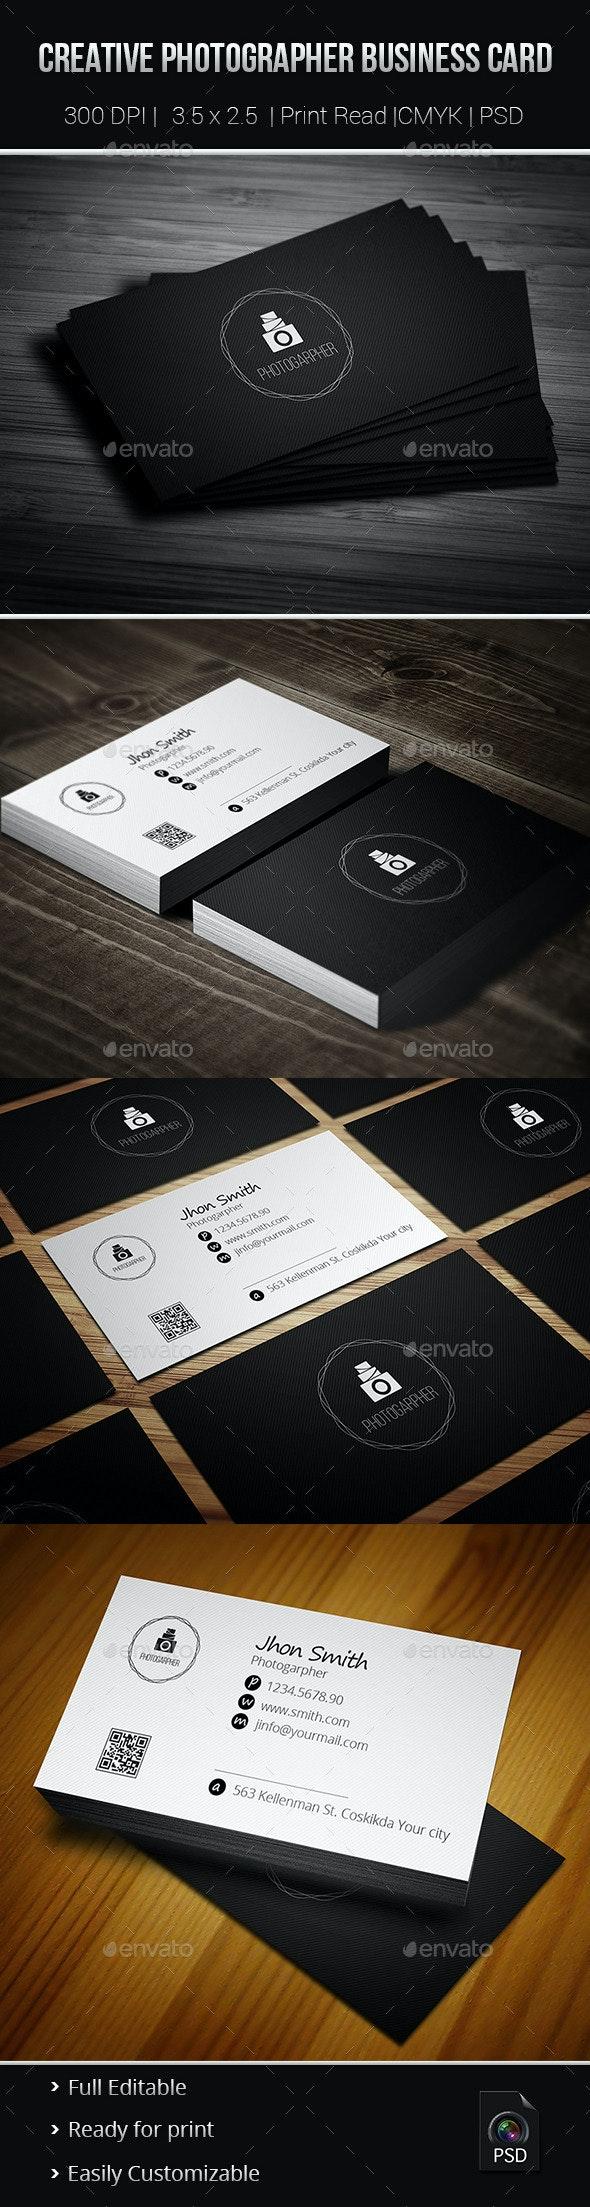 Creative Photgrapher Business Card 02 - Creative Business Cards